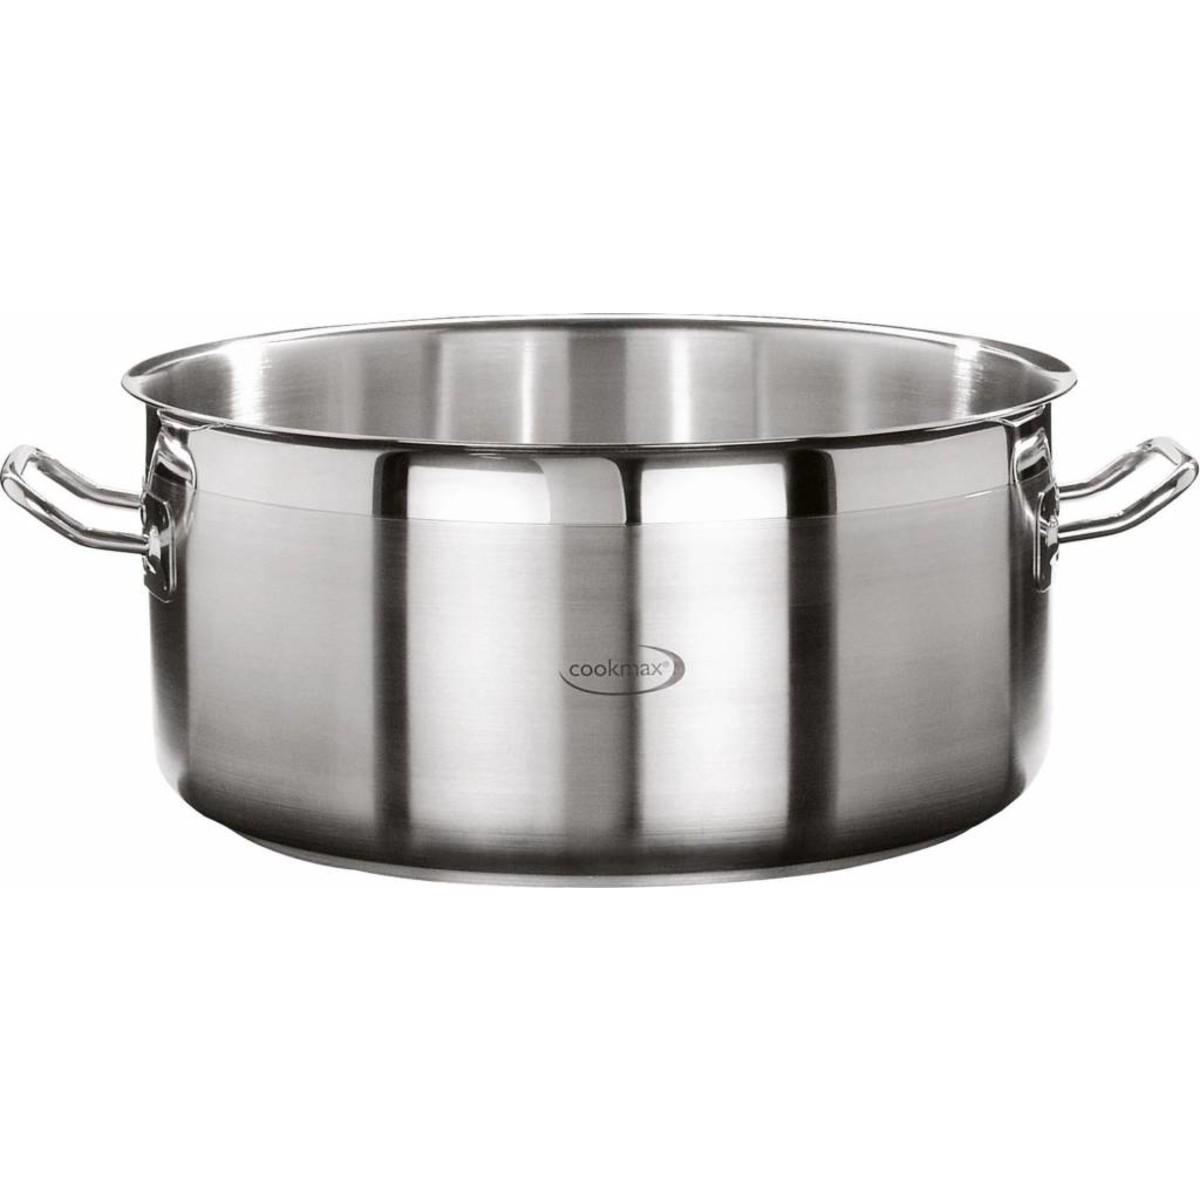 "Bratentopf flach ""Cookmax Professional"" Ø 36 cm, H: 17 cm. Inhalt 17,3L"